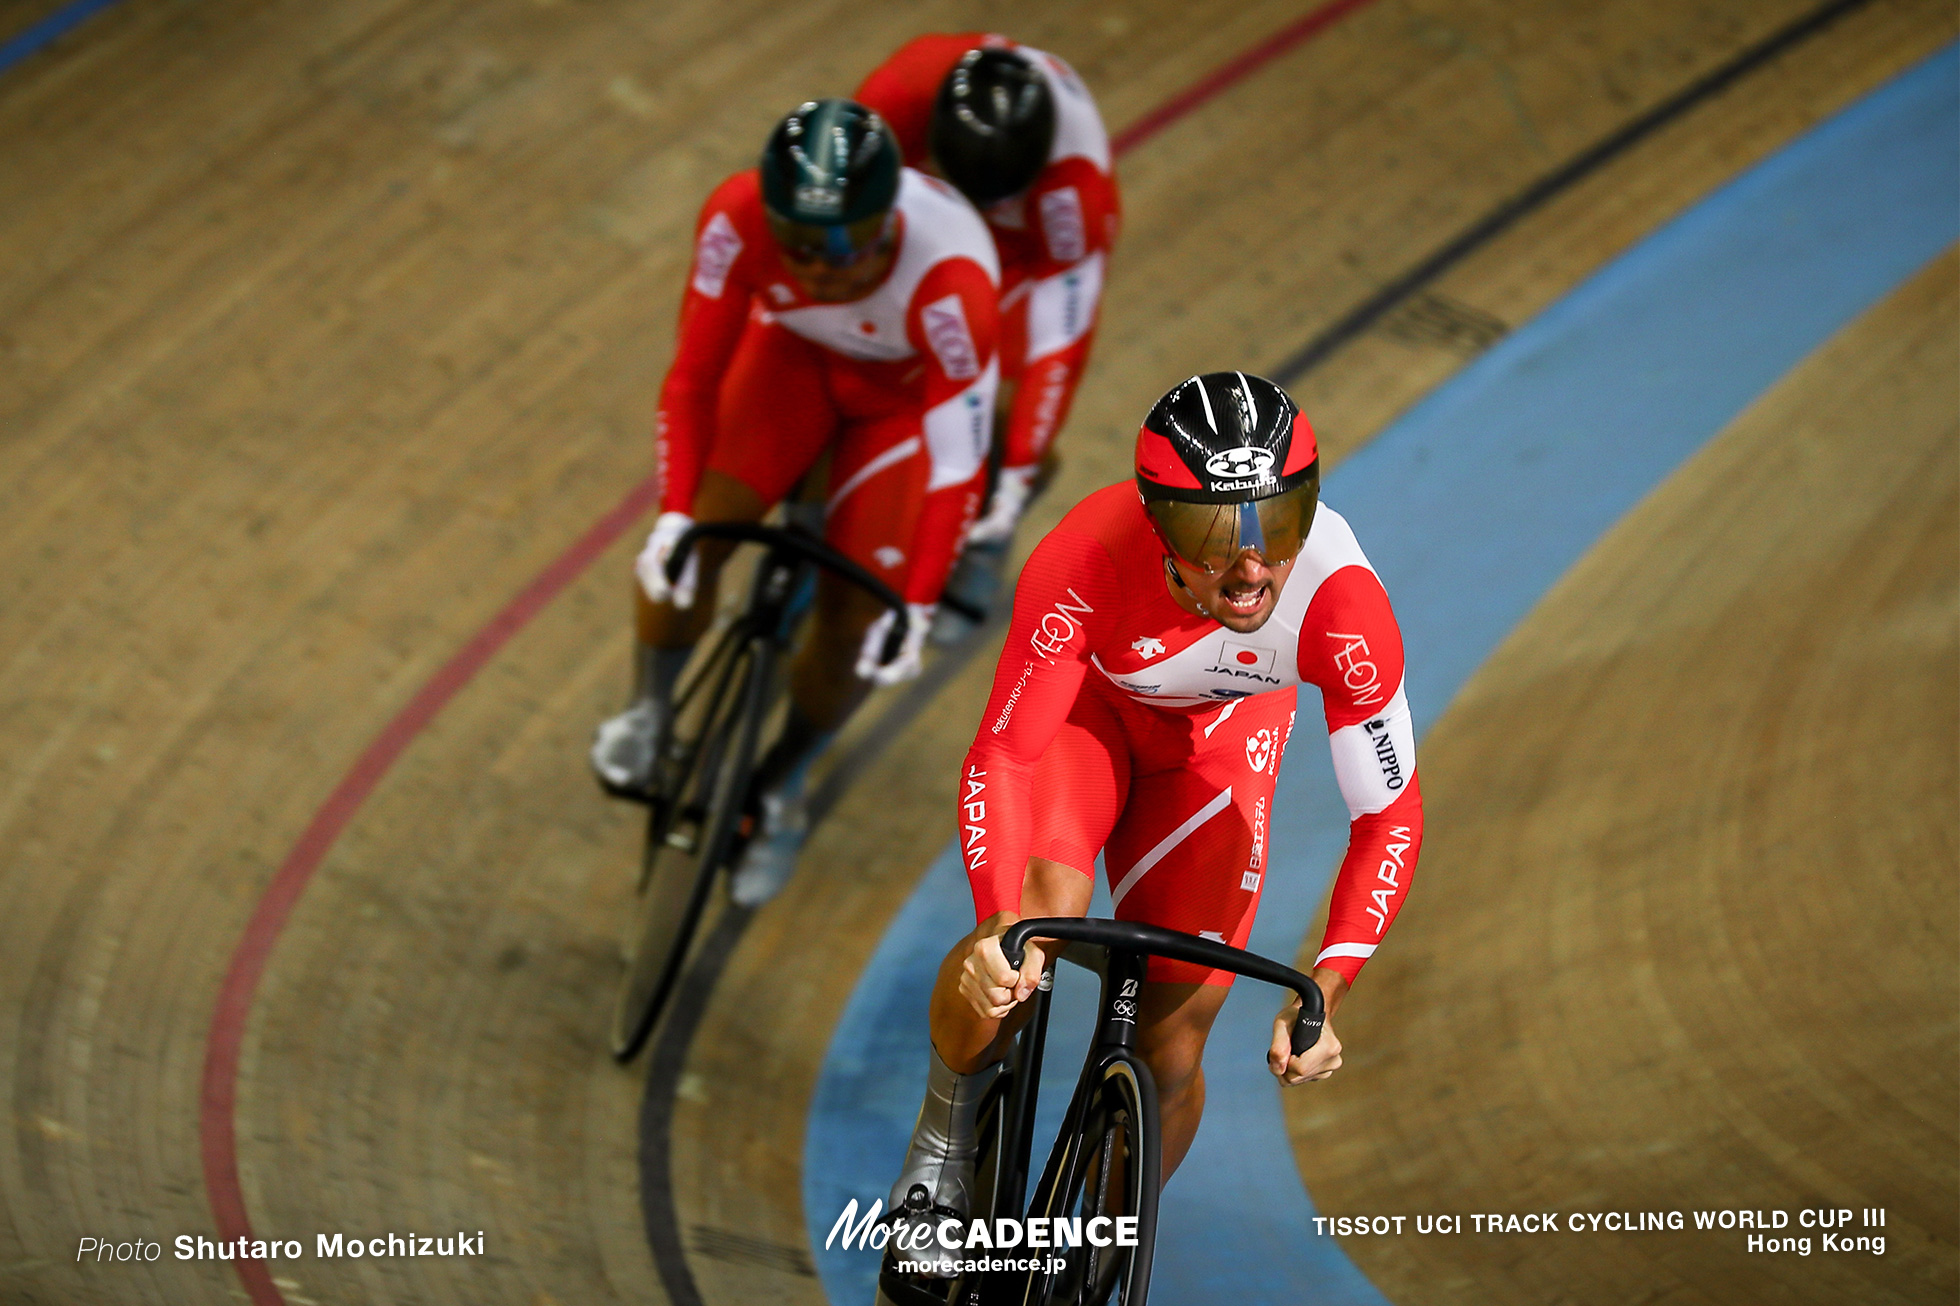 1st Round / Men's Team Sprint / TISSOT UCI TRACK CYCLING WORLD CUP III, Hong Kong, 雨谷一樹 新田祐大 深谷知広